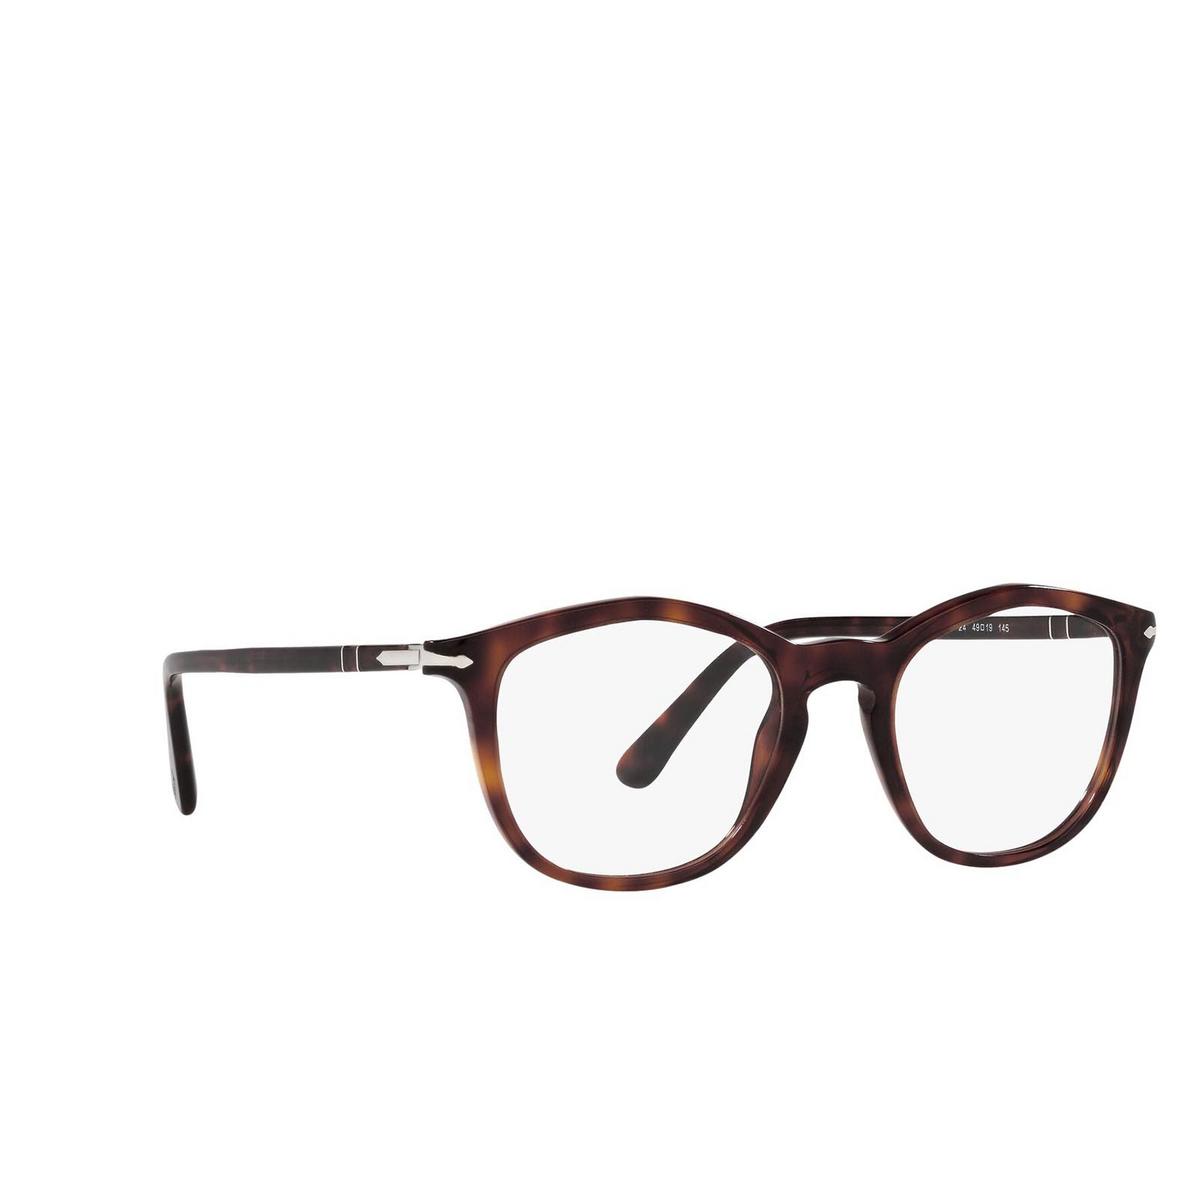 Persol® Irregular Eyeglasses: PO3267V color Havana 24 - three-quarters view.